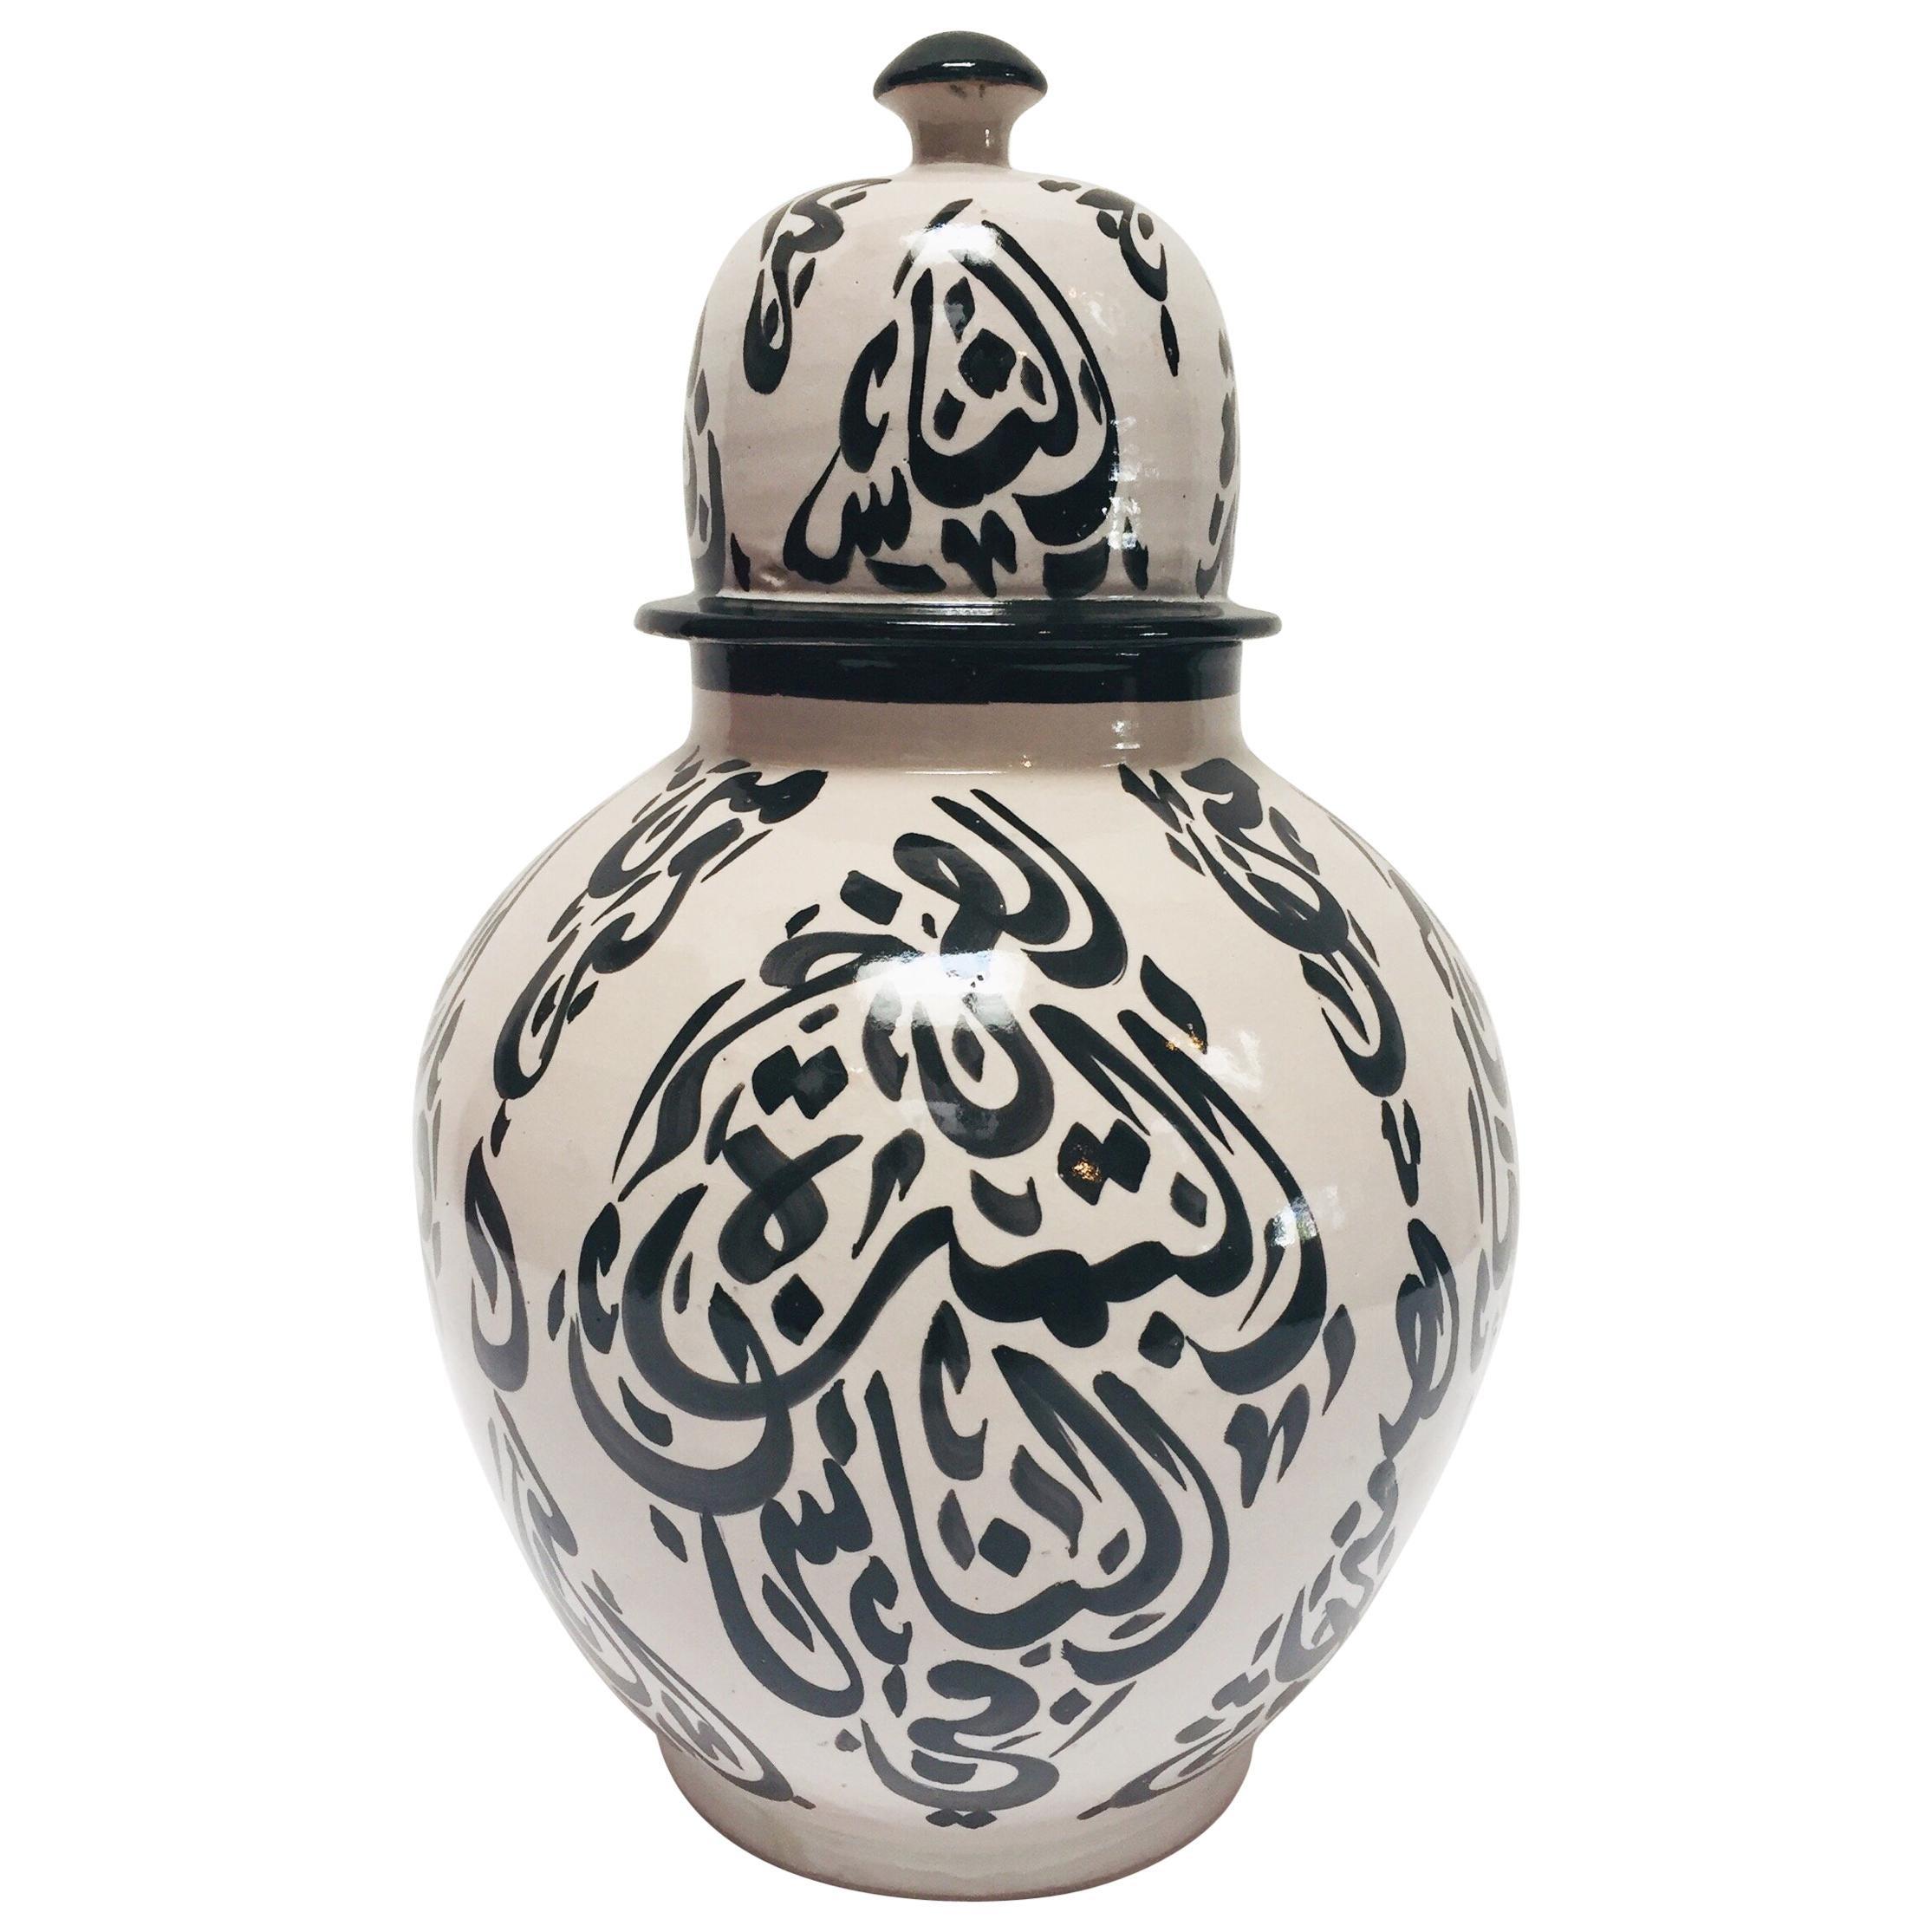 Moorish Ceramic Lidded Urn with Arabic Calligraphy Lettrism Black Writing